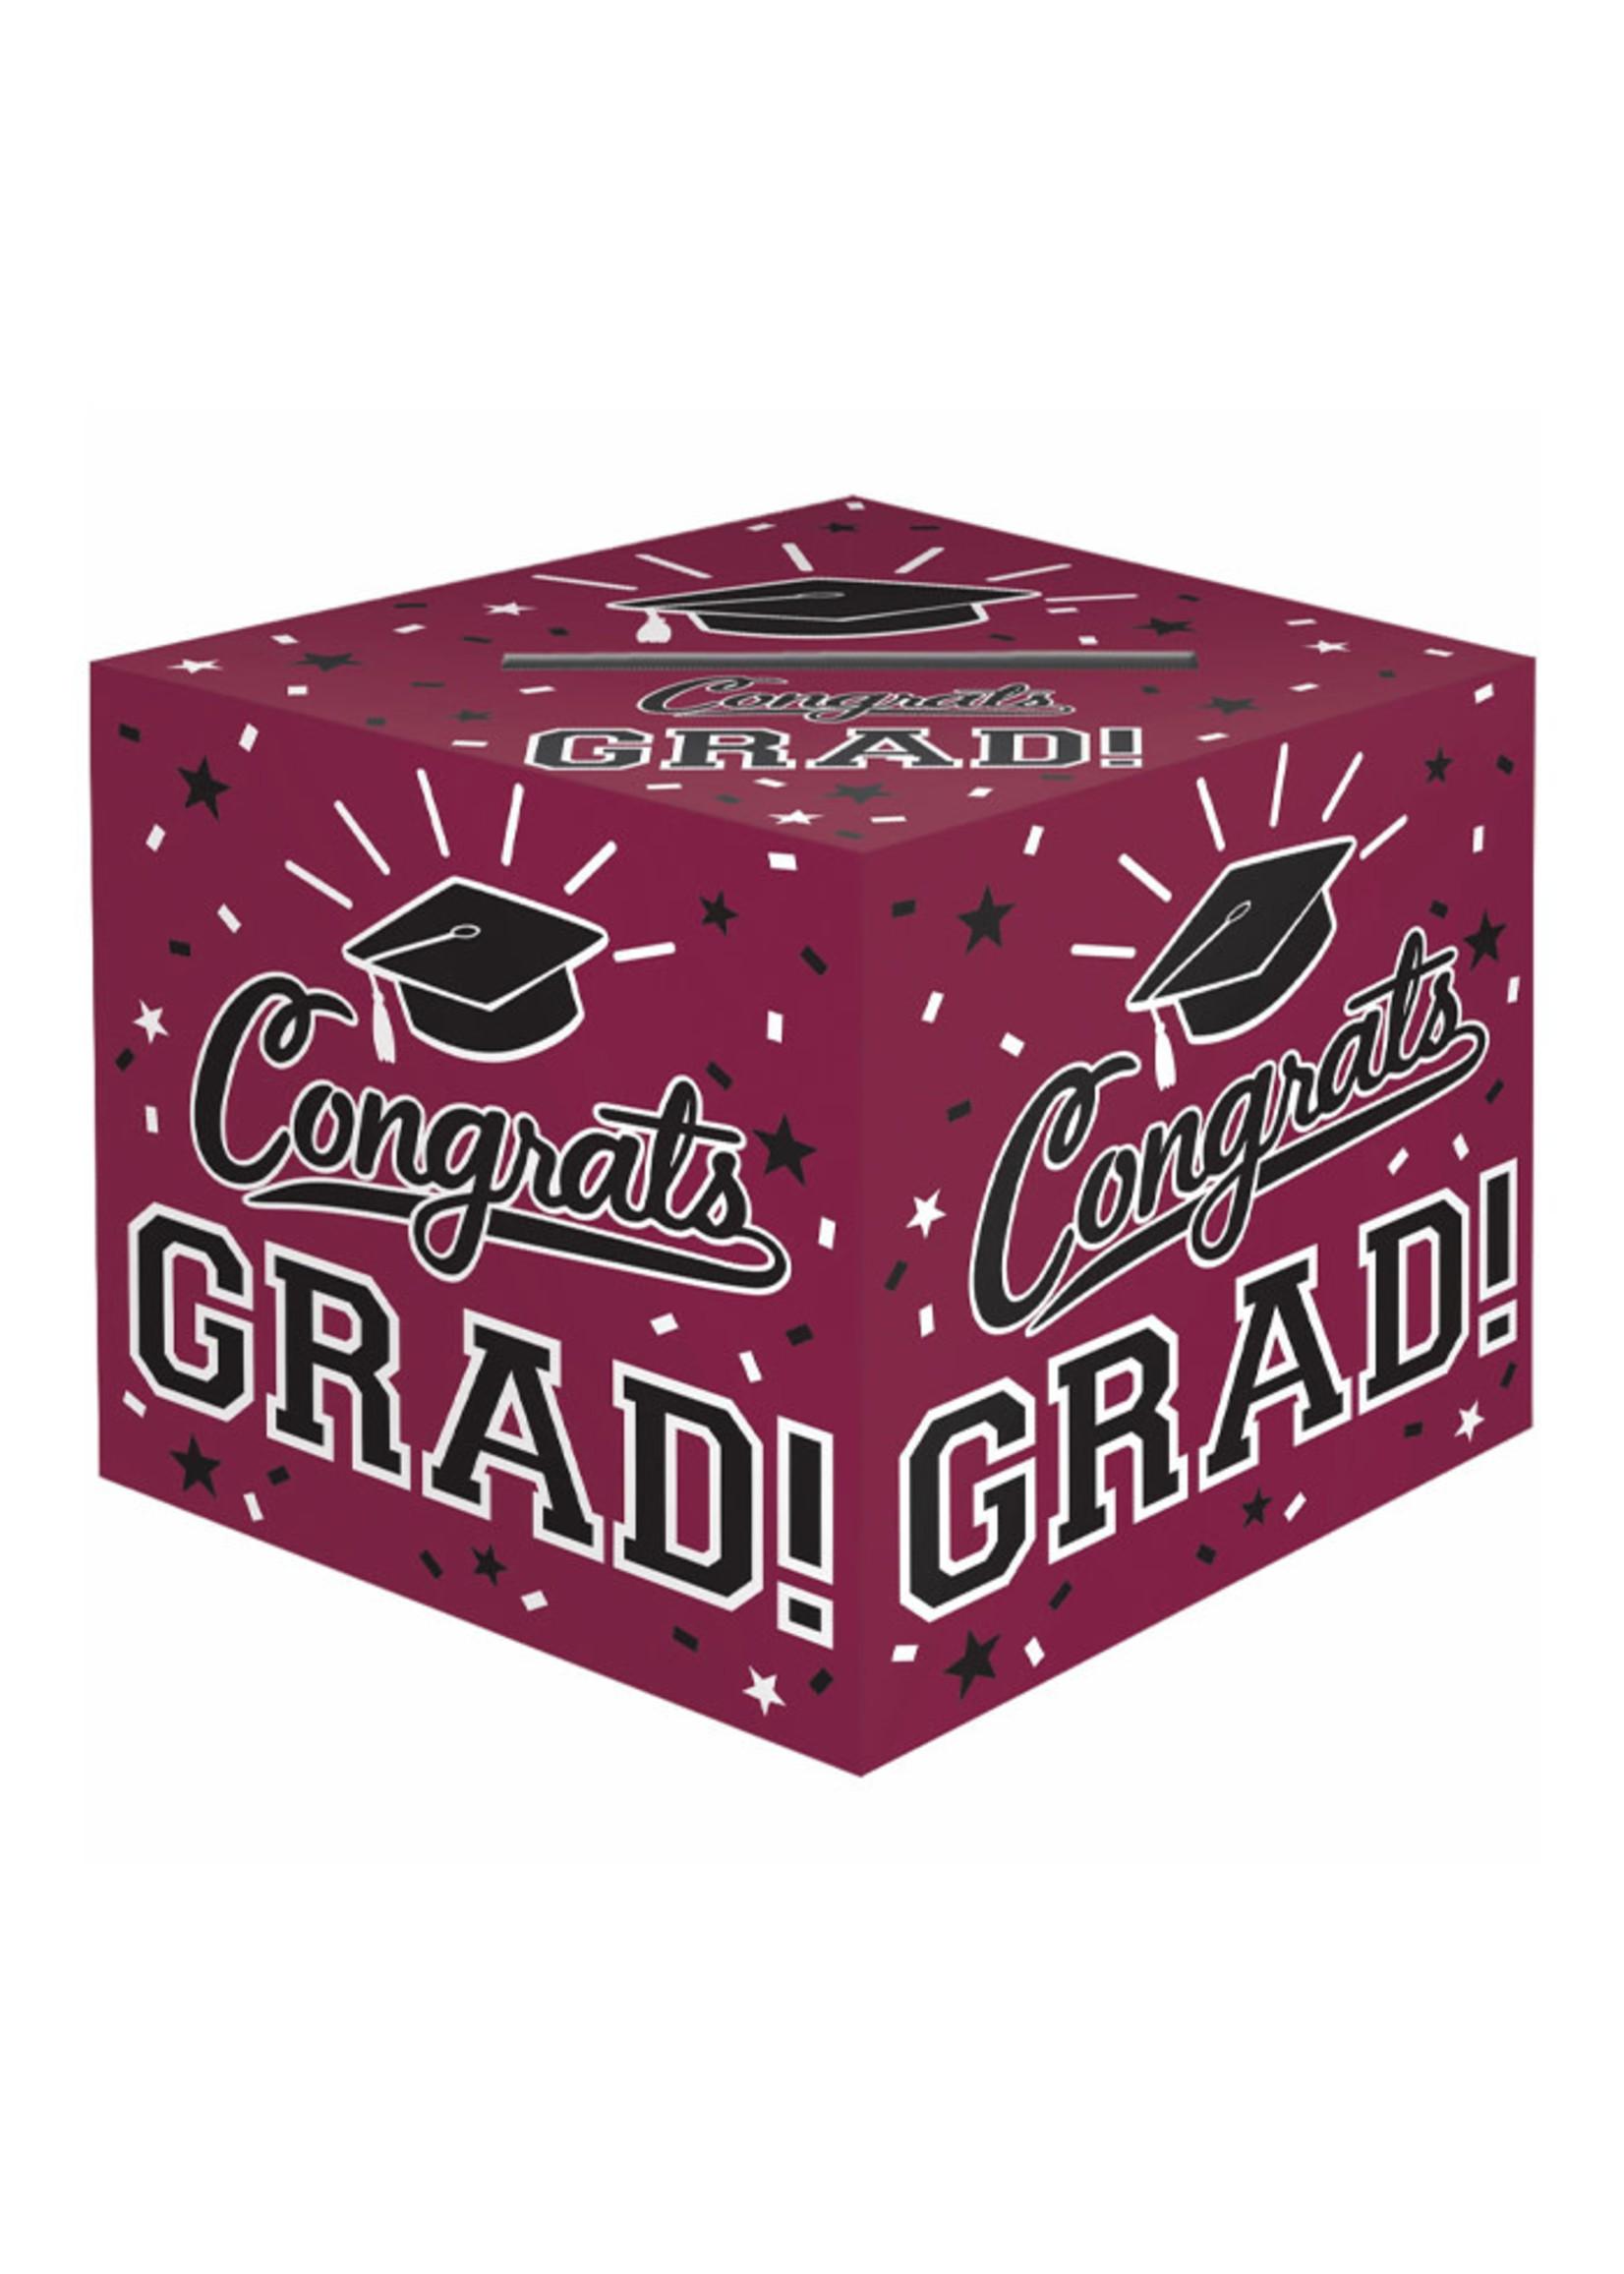 Cardholder Box Grad - Burgundy